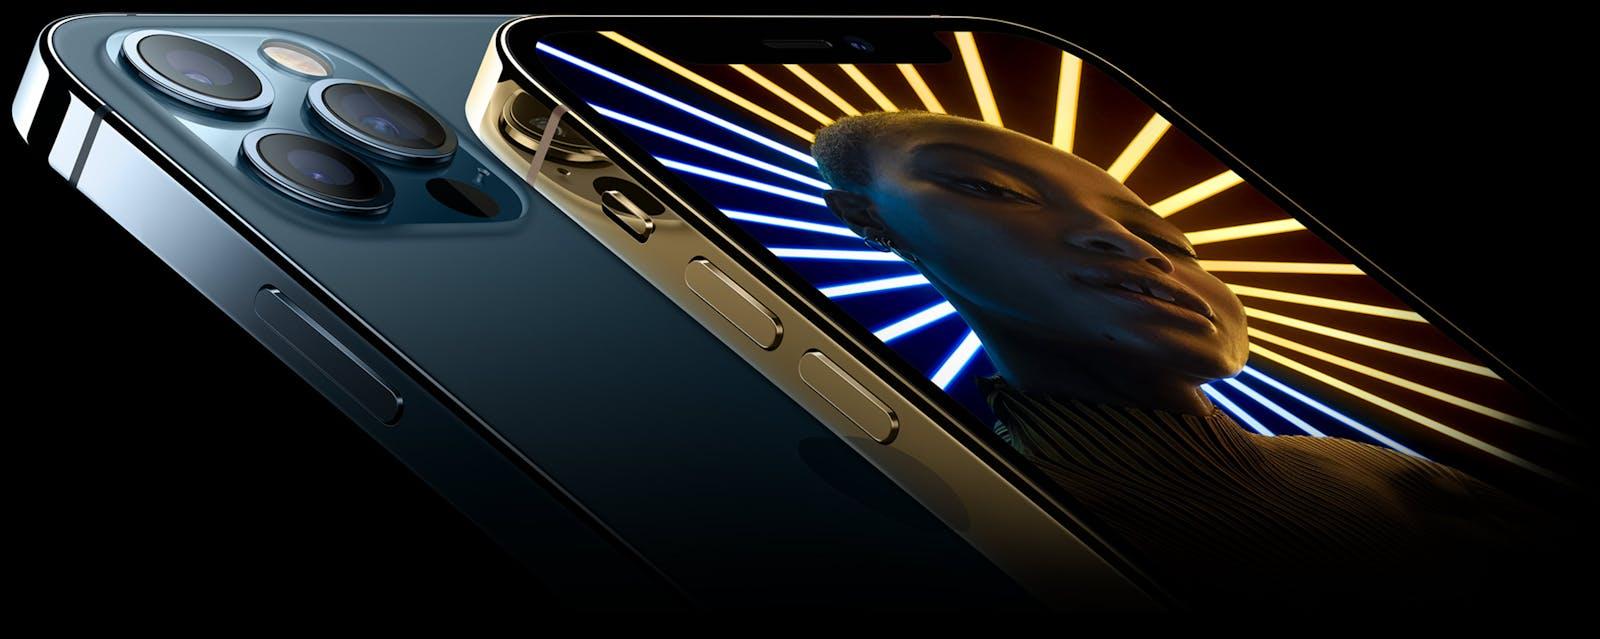 Detta vet vi om iPhone 13 – pris, datum, senaste nytt